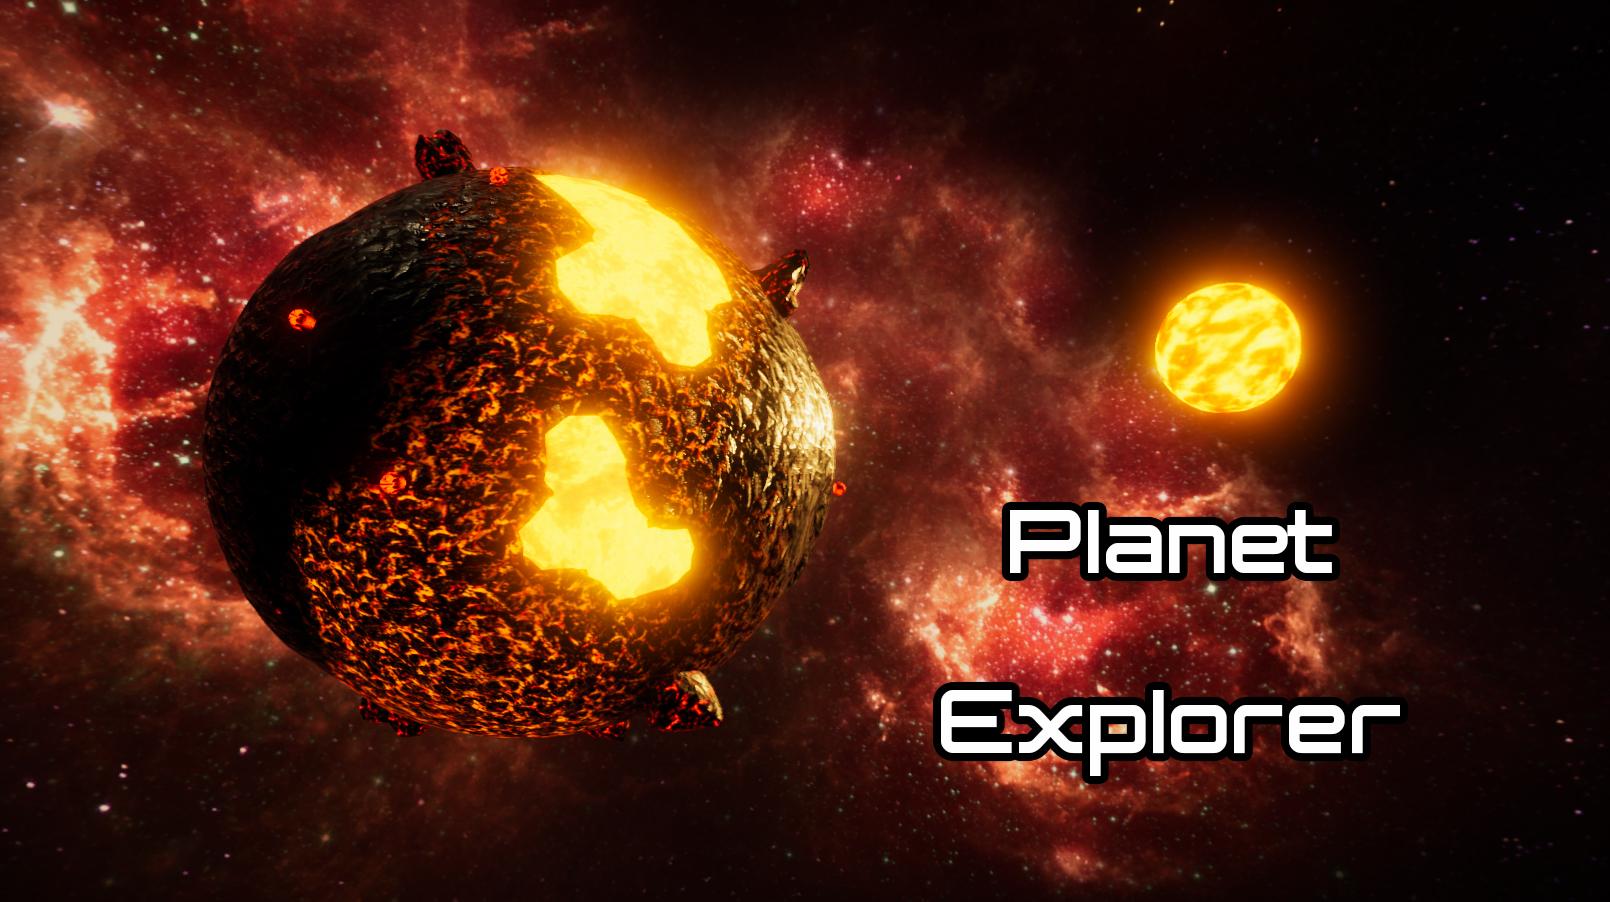 Planet Explorer